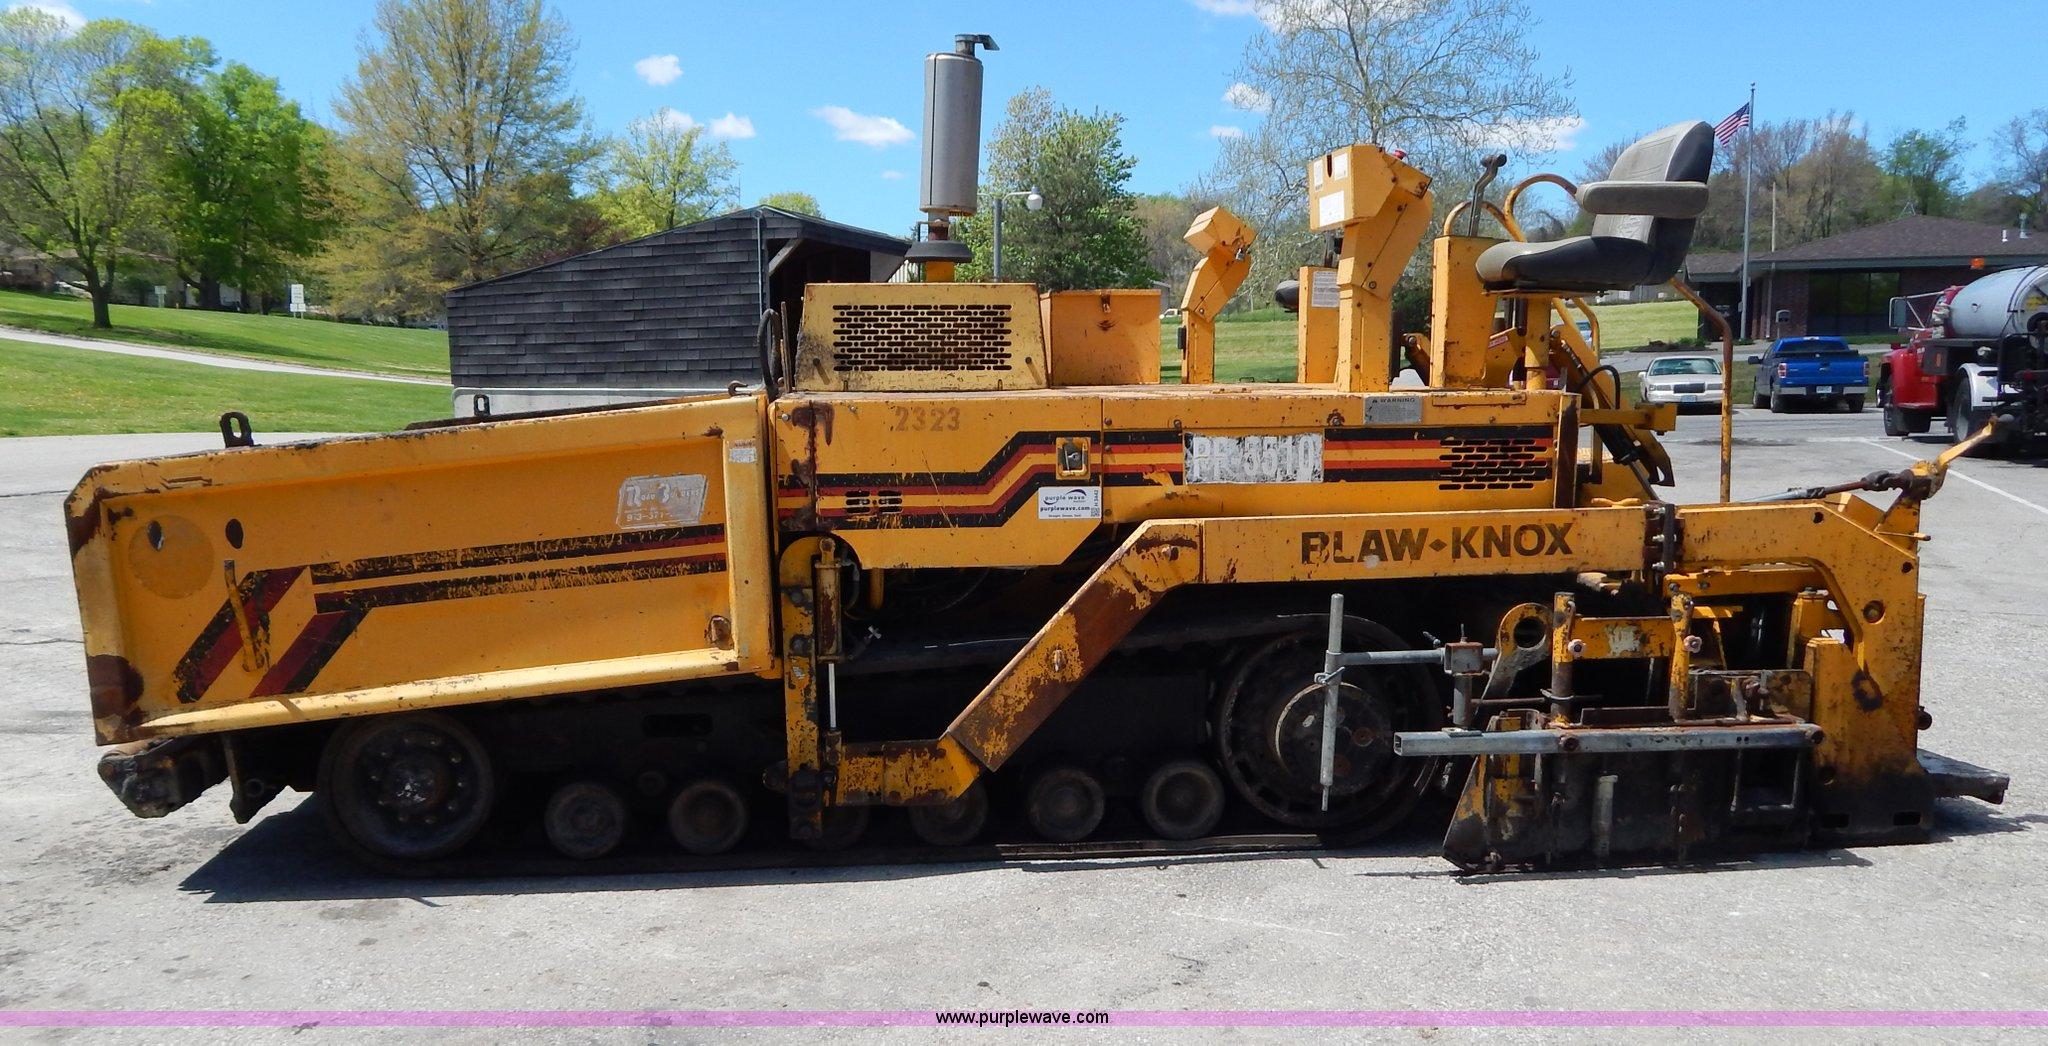 ... Blaw-Knox PF5510 crawler asphalt paver Full size in new window ...